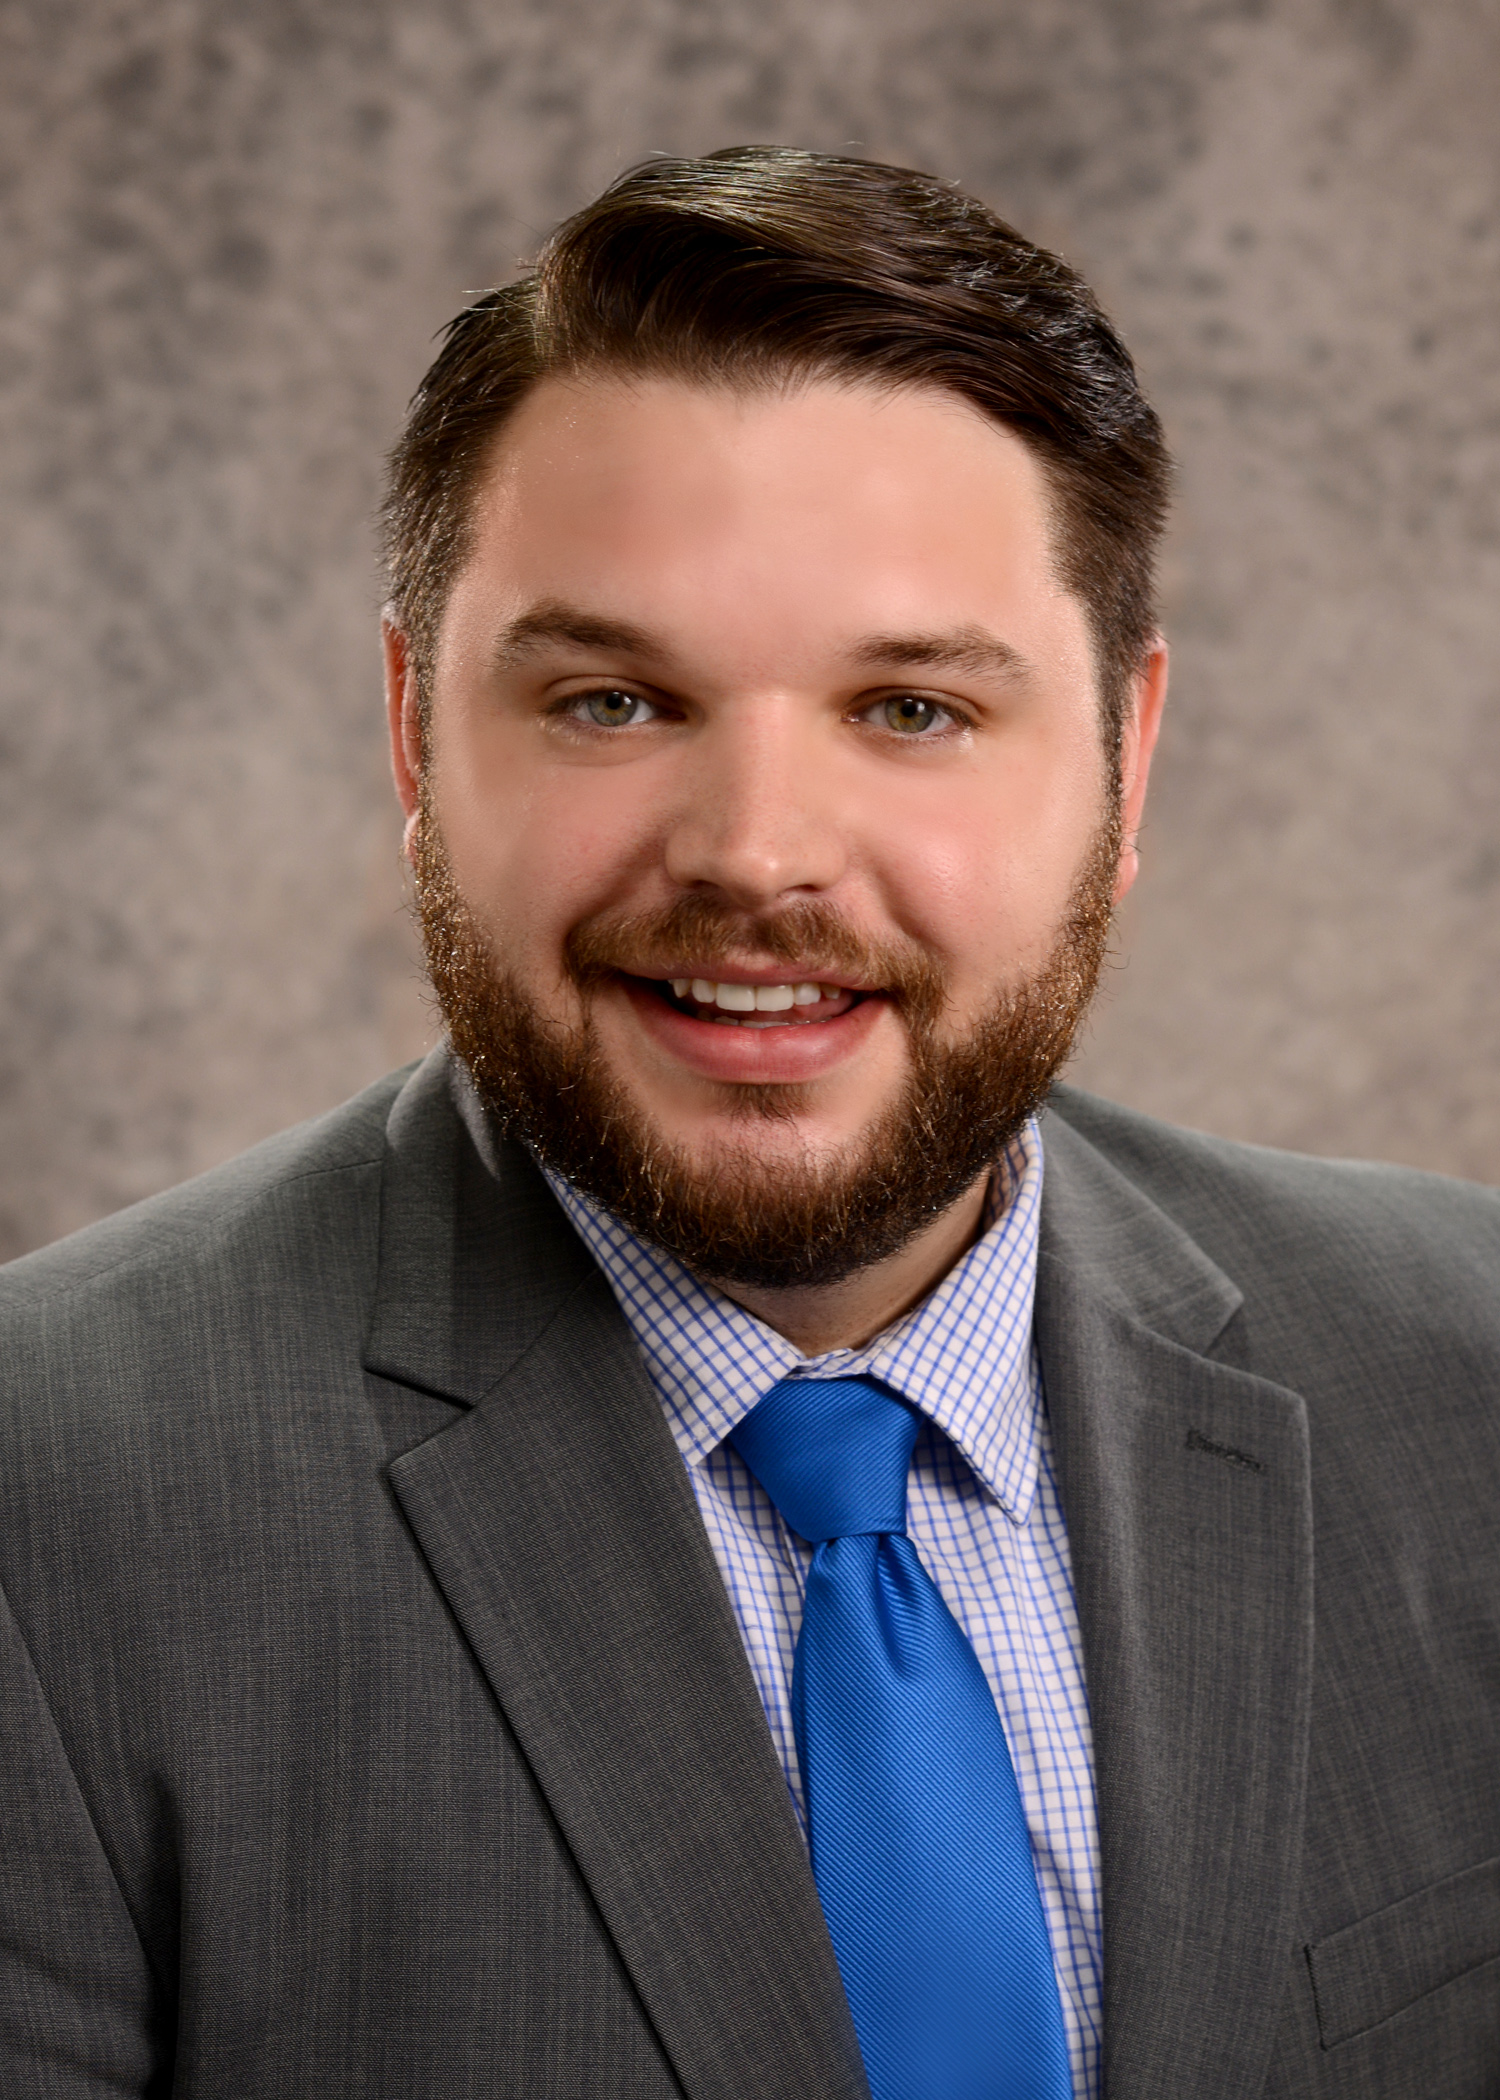 Brandon Alexander Co-Director of Elections (573) 751-5831  brandon.alexander@sos.mo.gov   Website